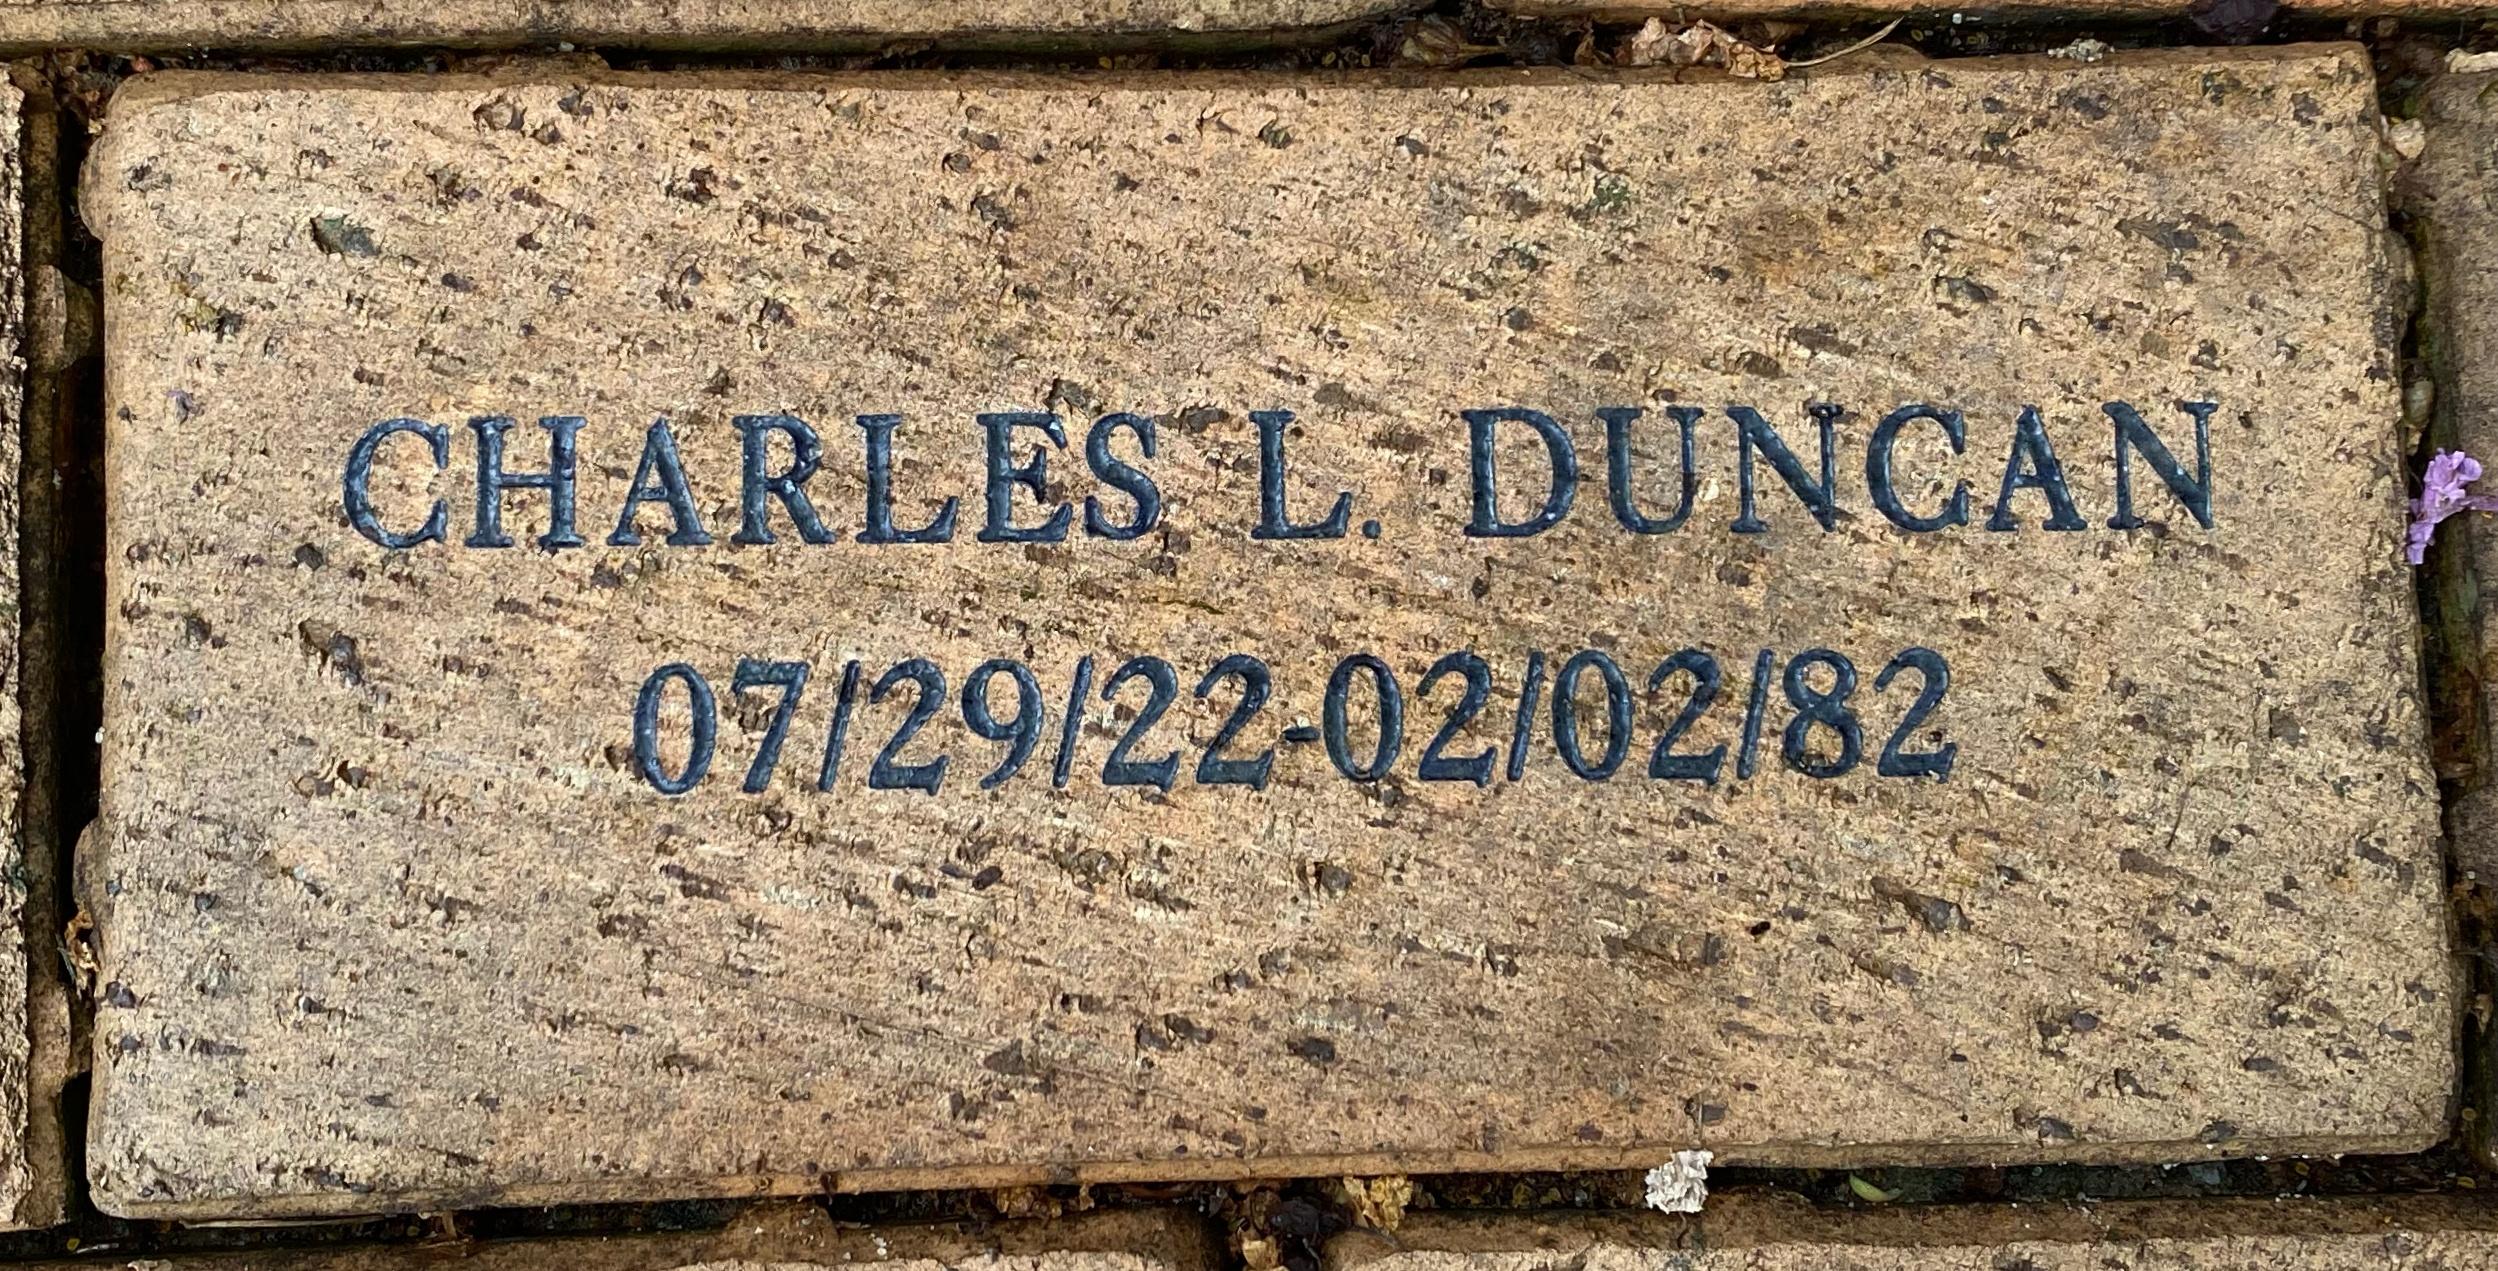 CHARLES L. DUNCAN 07/29/22 – 02/02/82